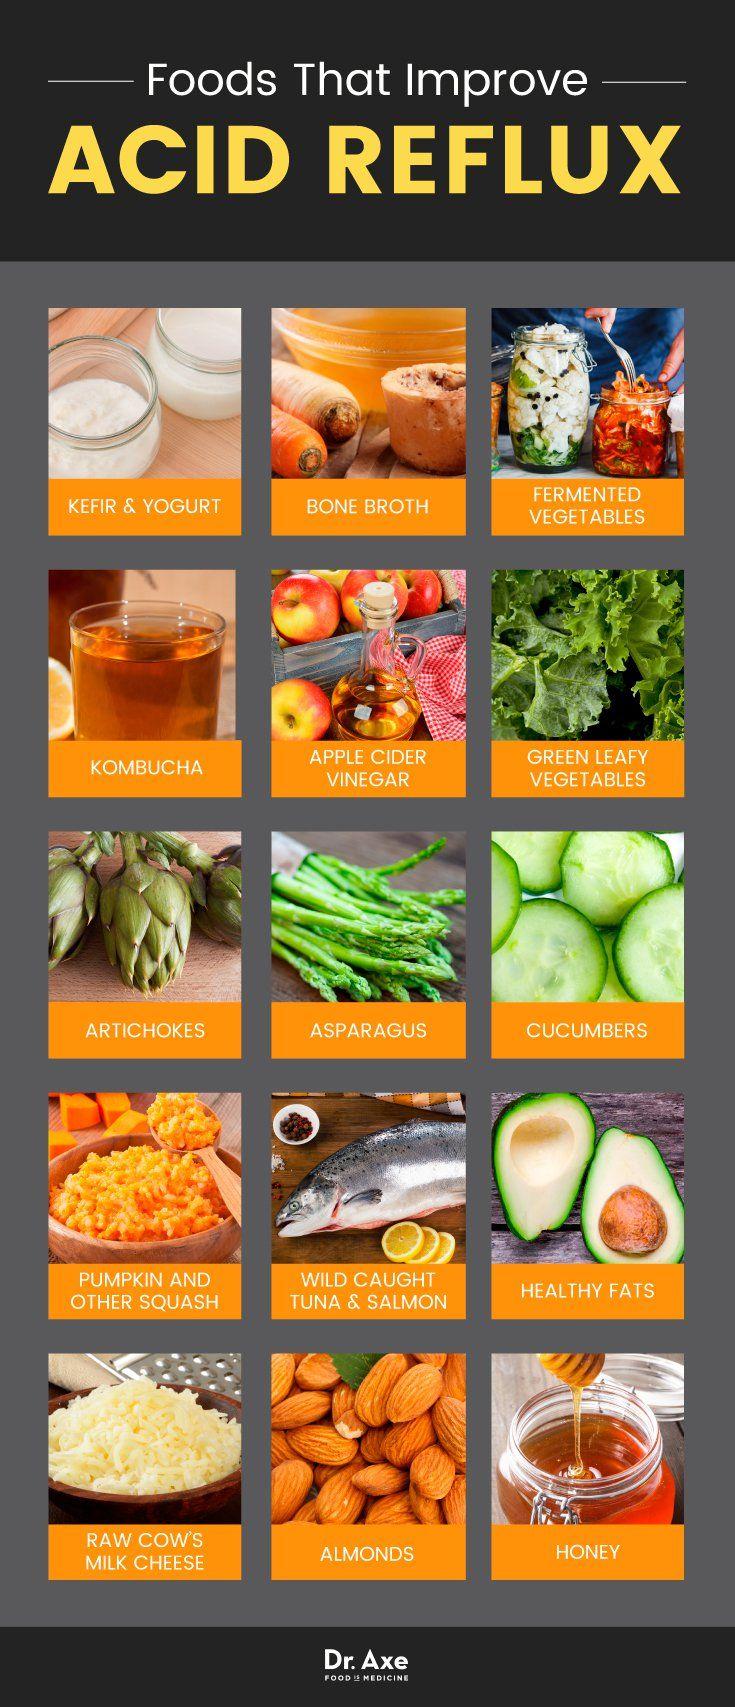 Foods that improve acid reflux symptoms - Dr. Axe